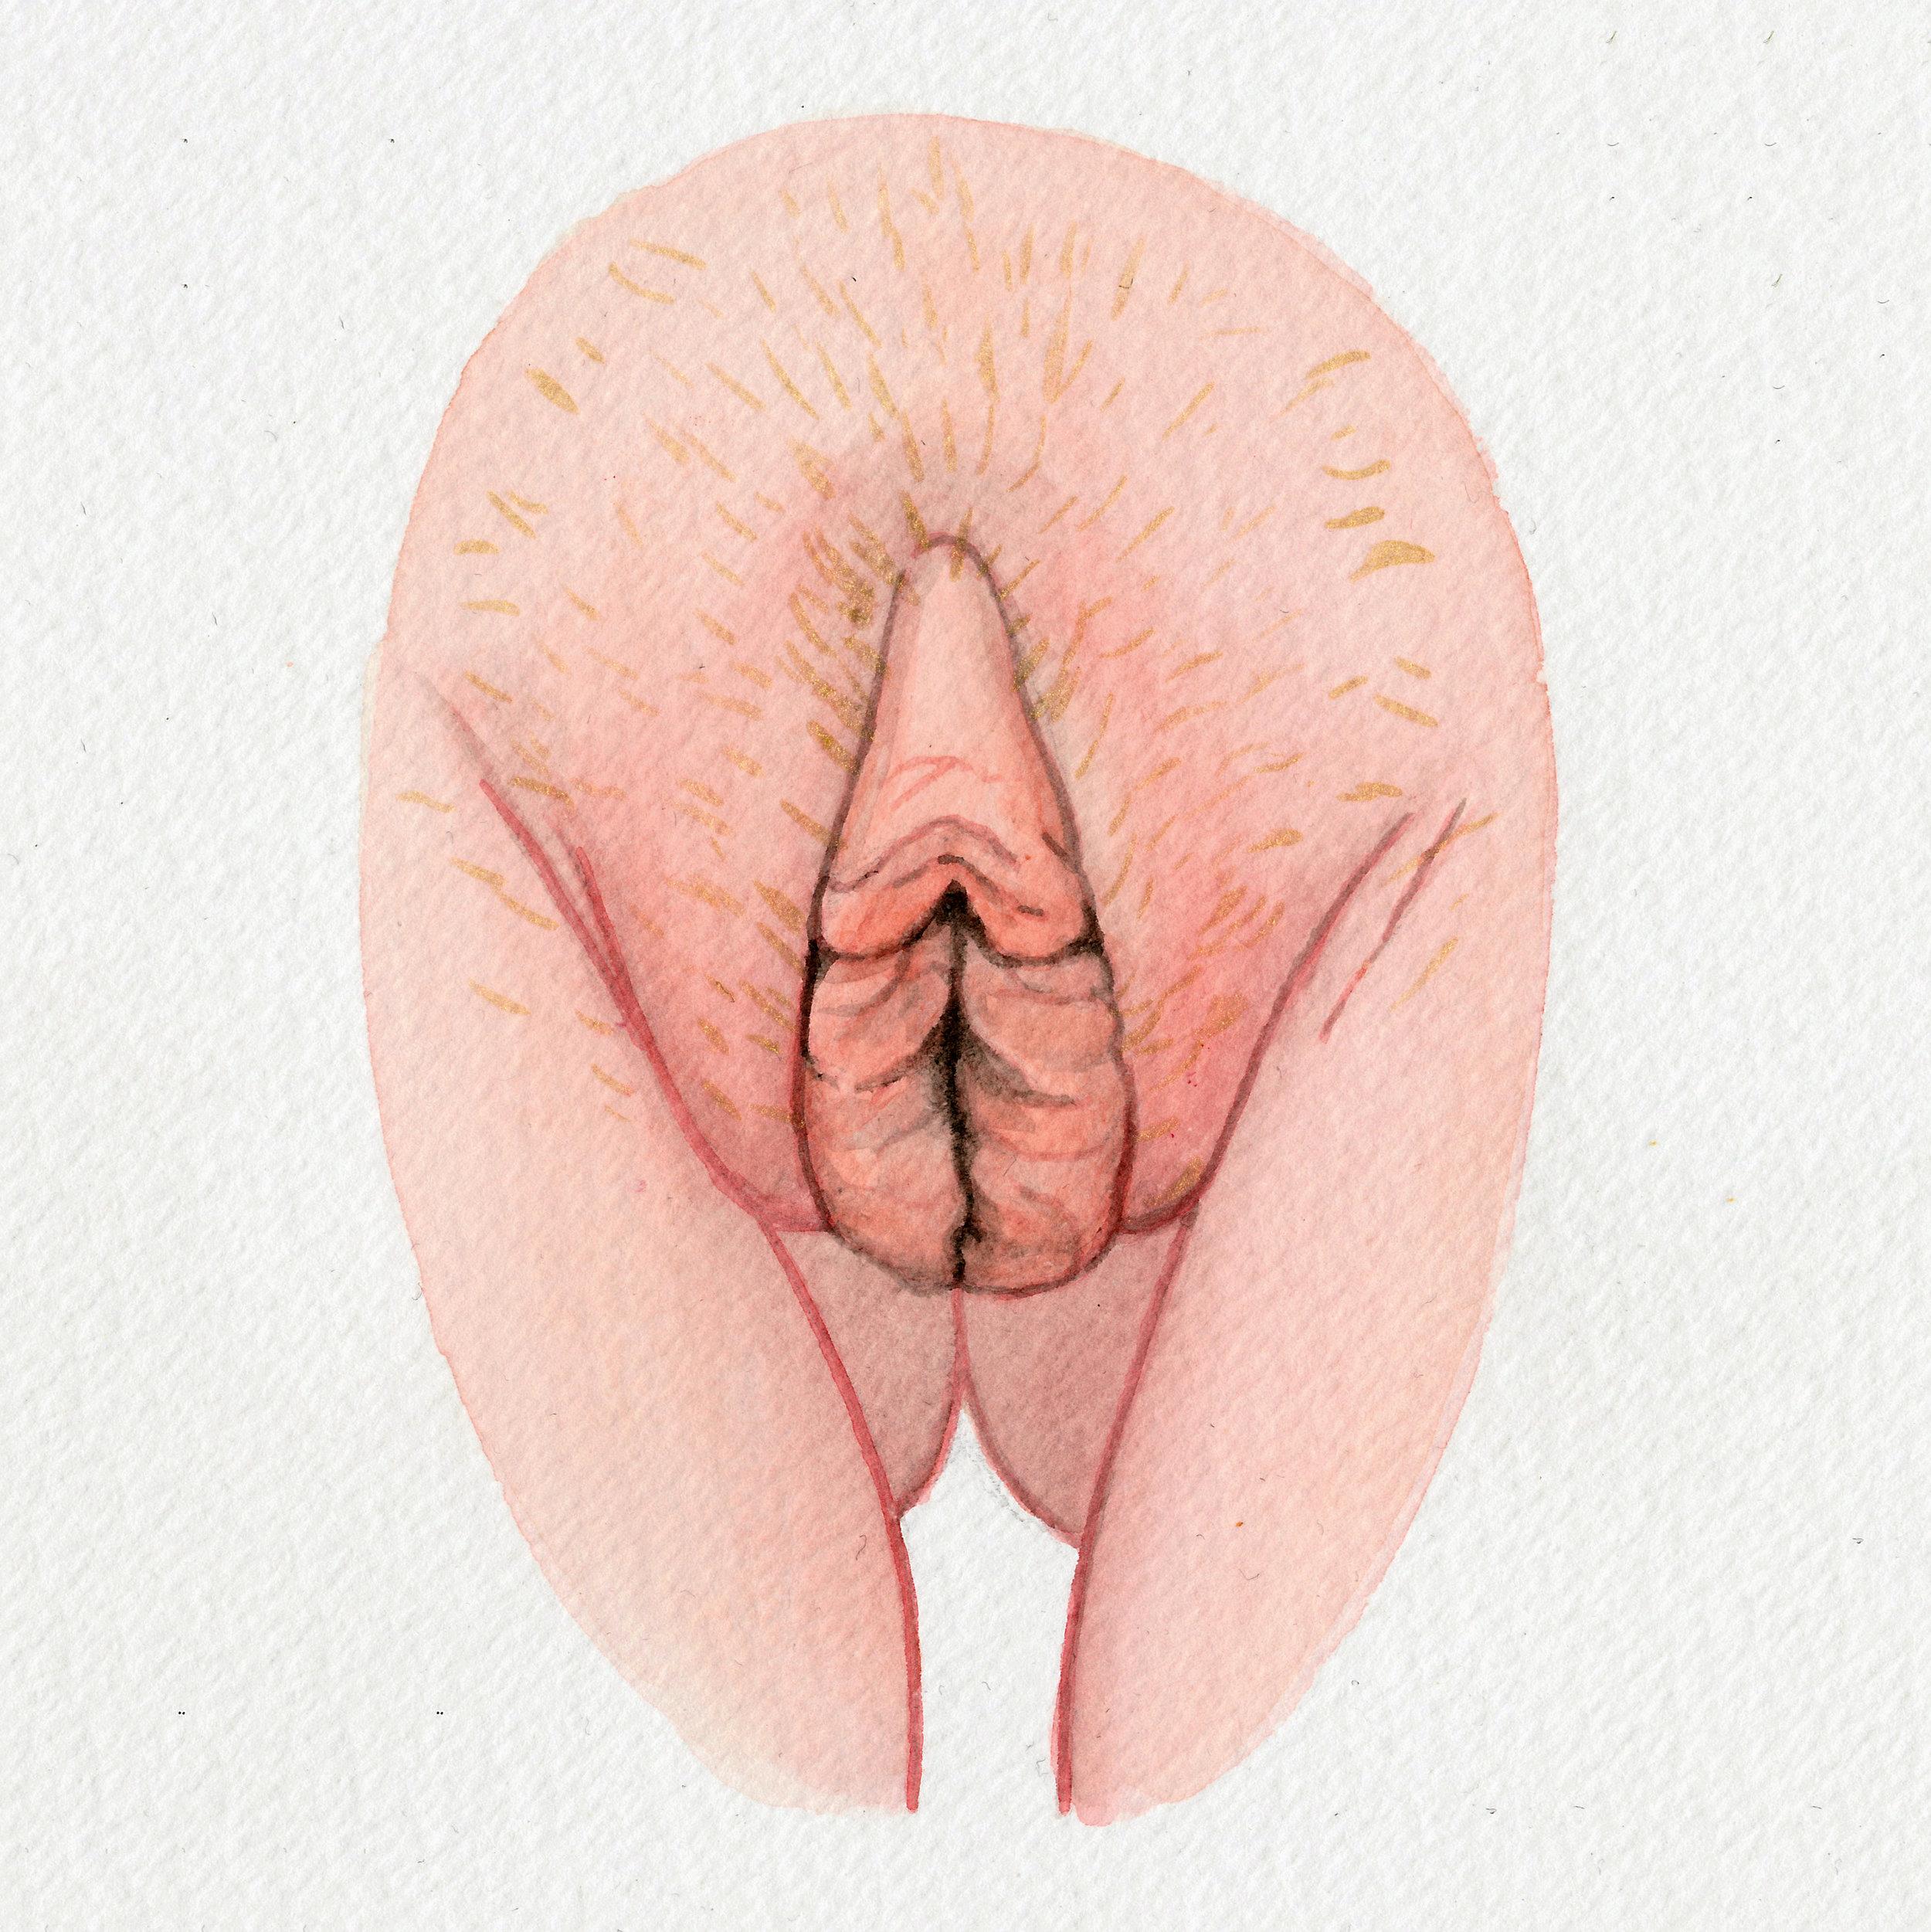 The Vulva Gallery - Vulva Portrait #117 (s).jpg